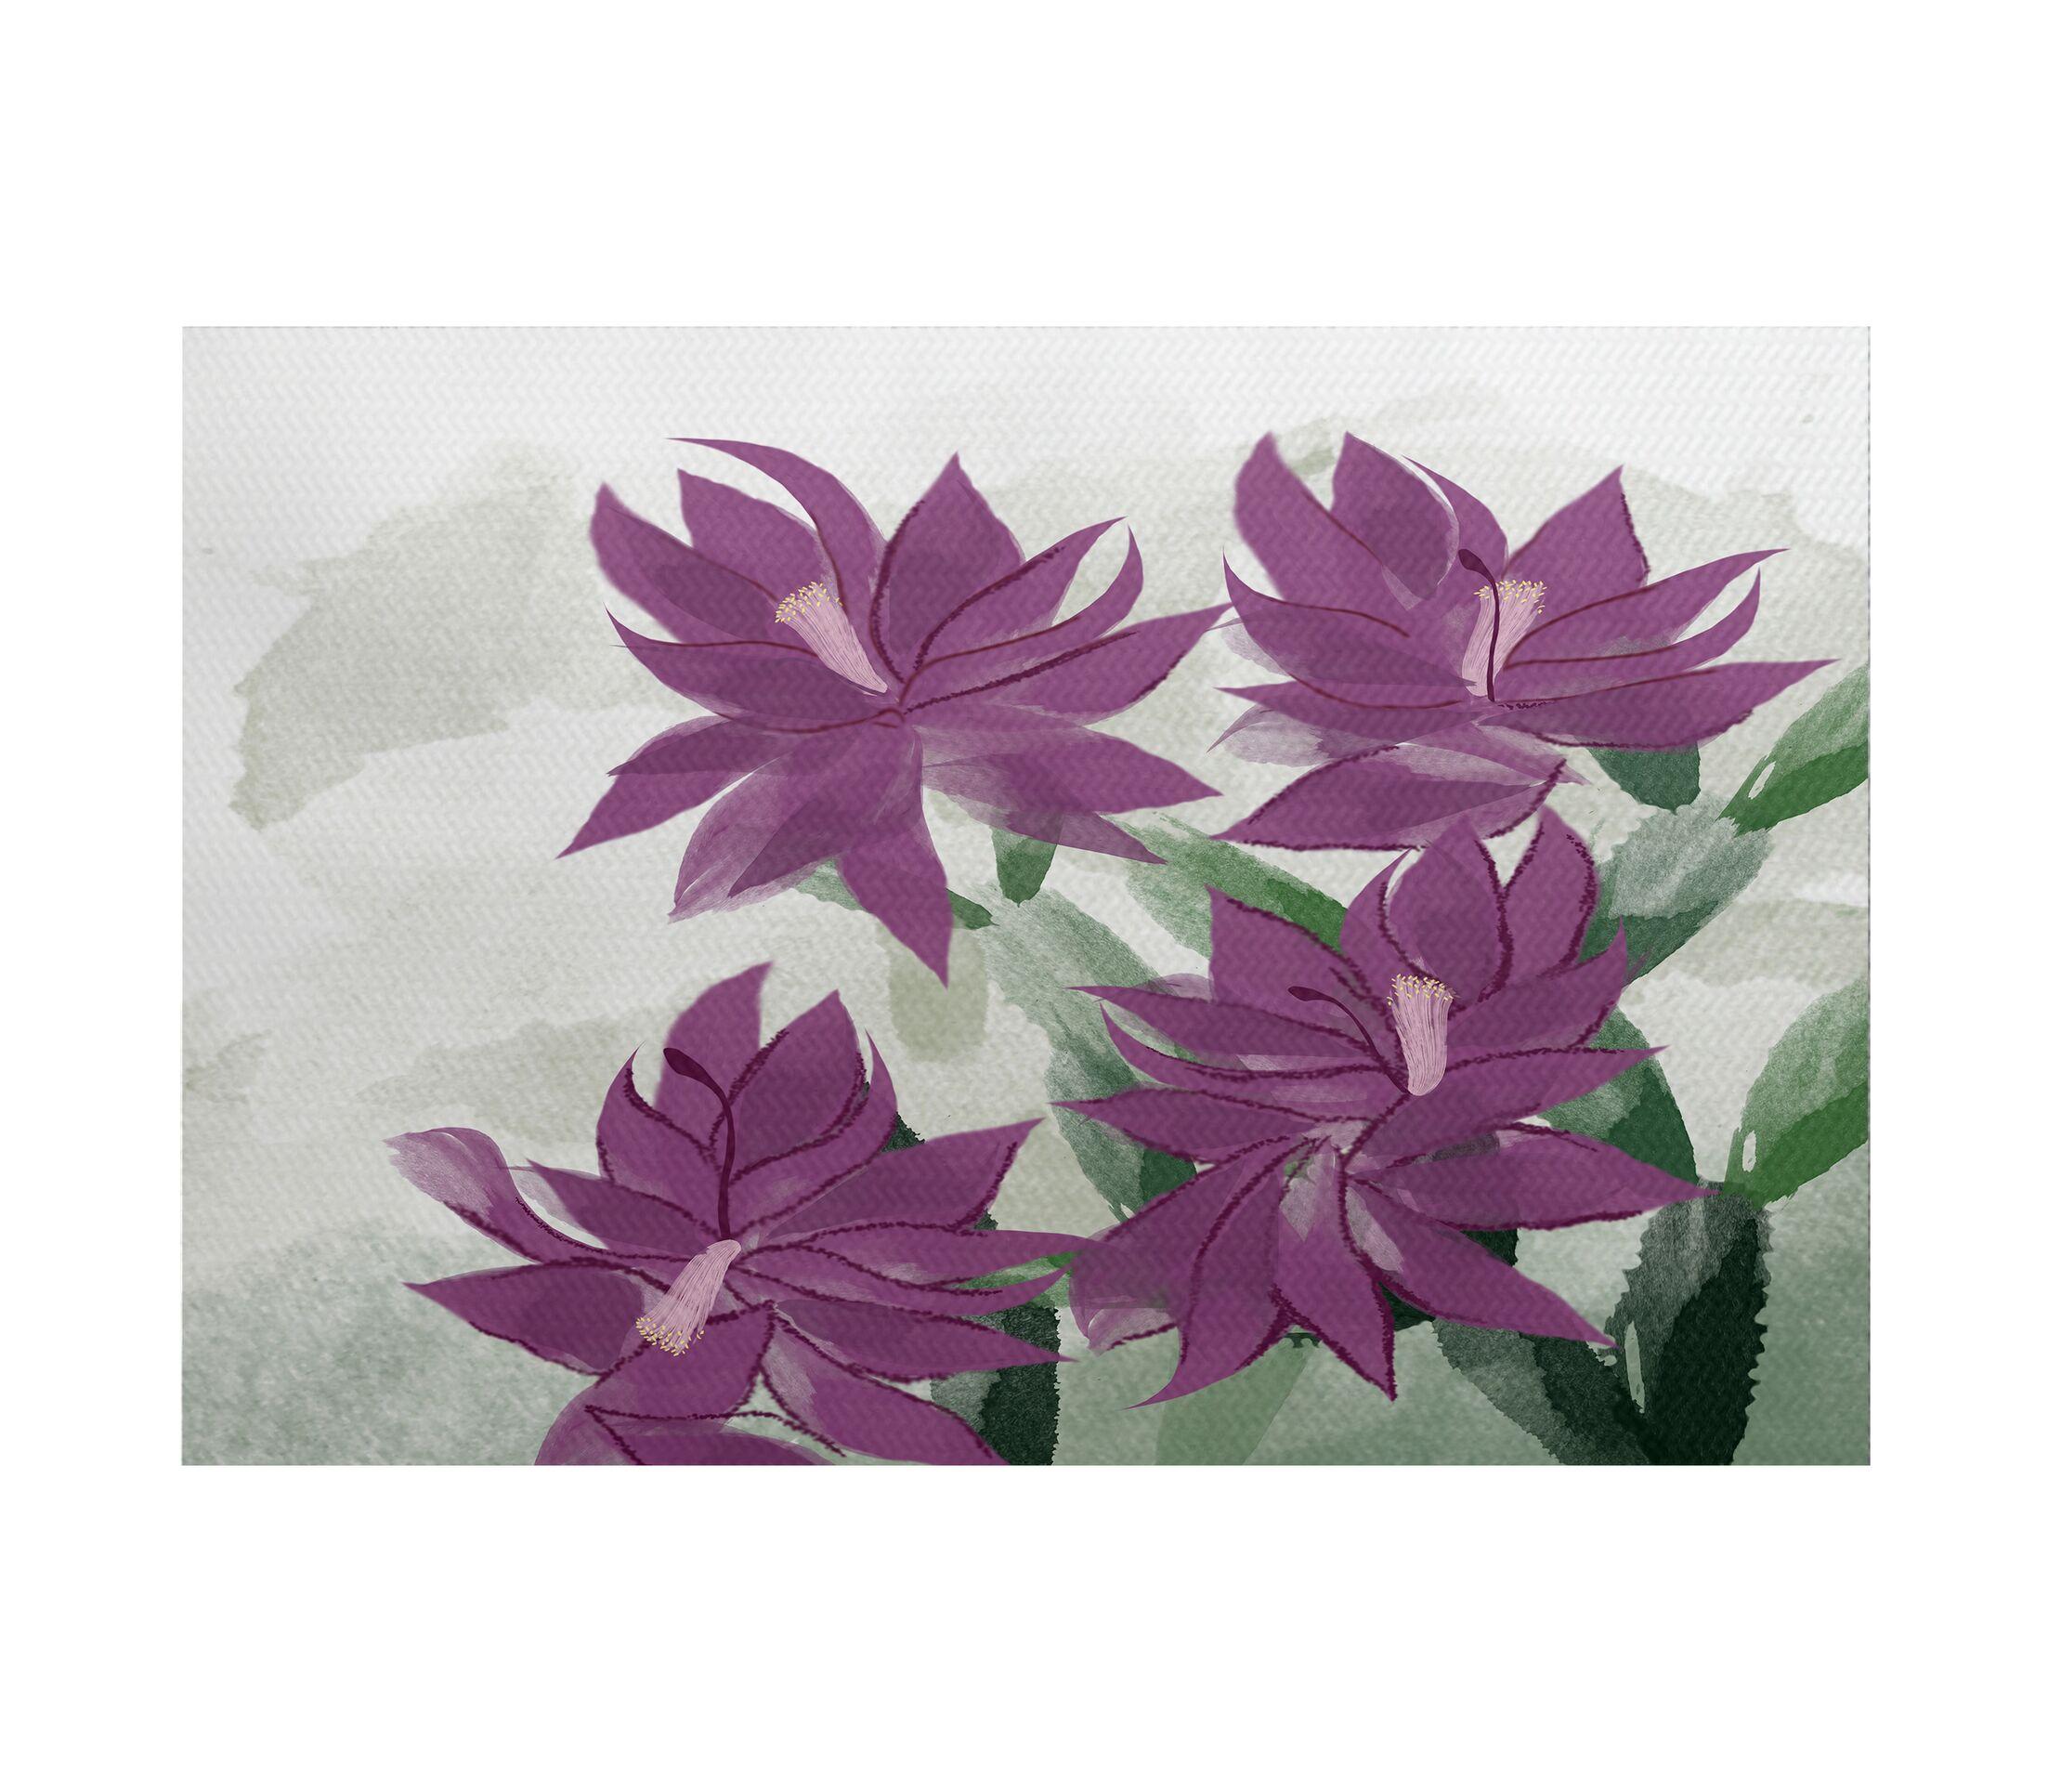 Amanda Christmas Cactus Floral Print Purple/Green Indoor/Outdoor Area Rug Rug Size: Rectangle 3' x 5'